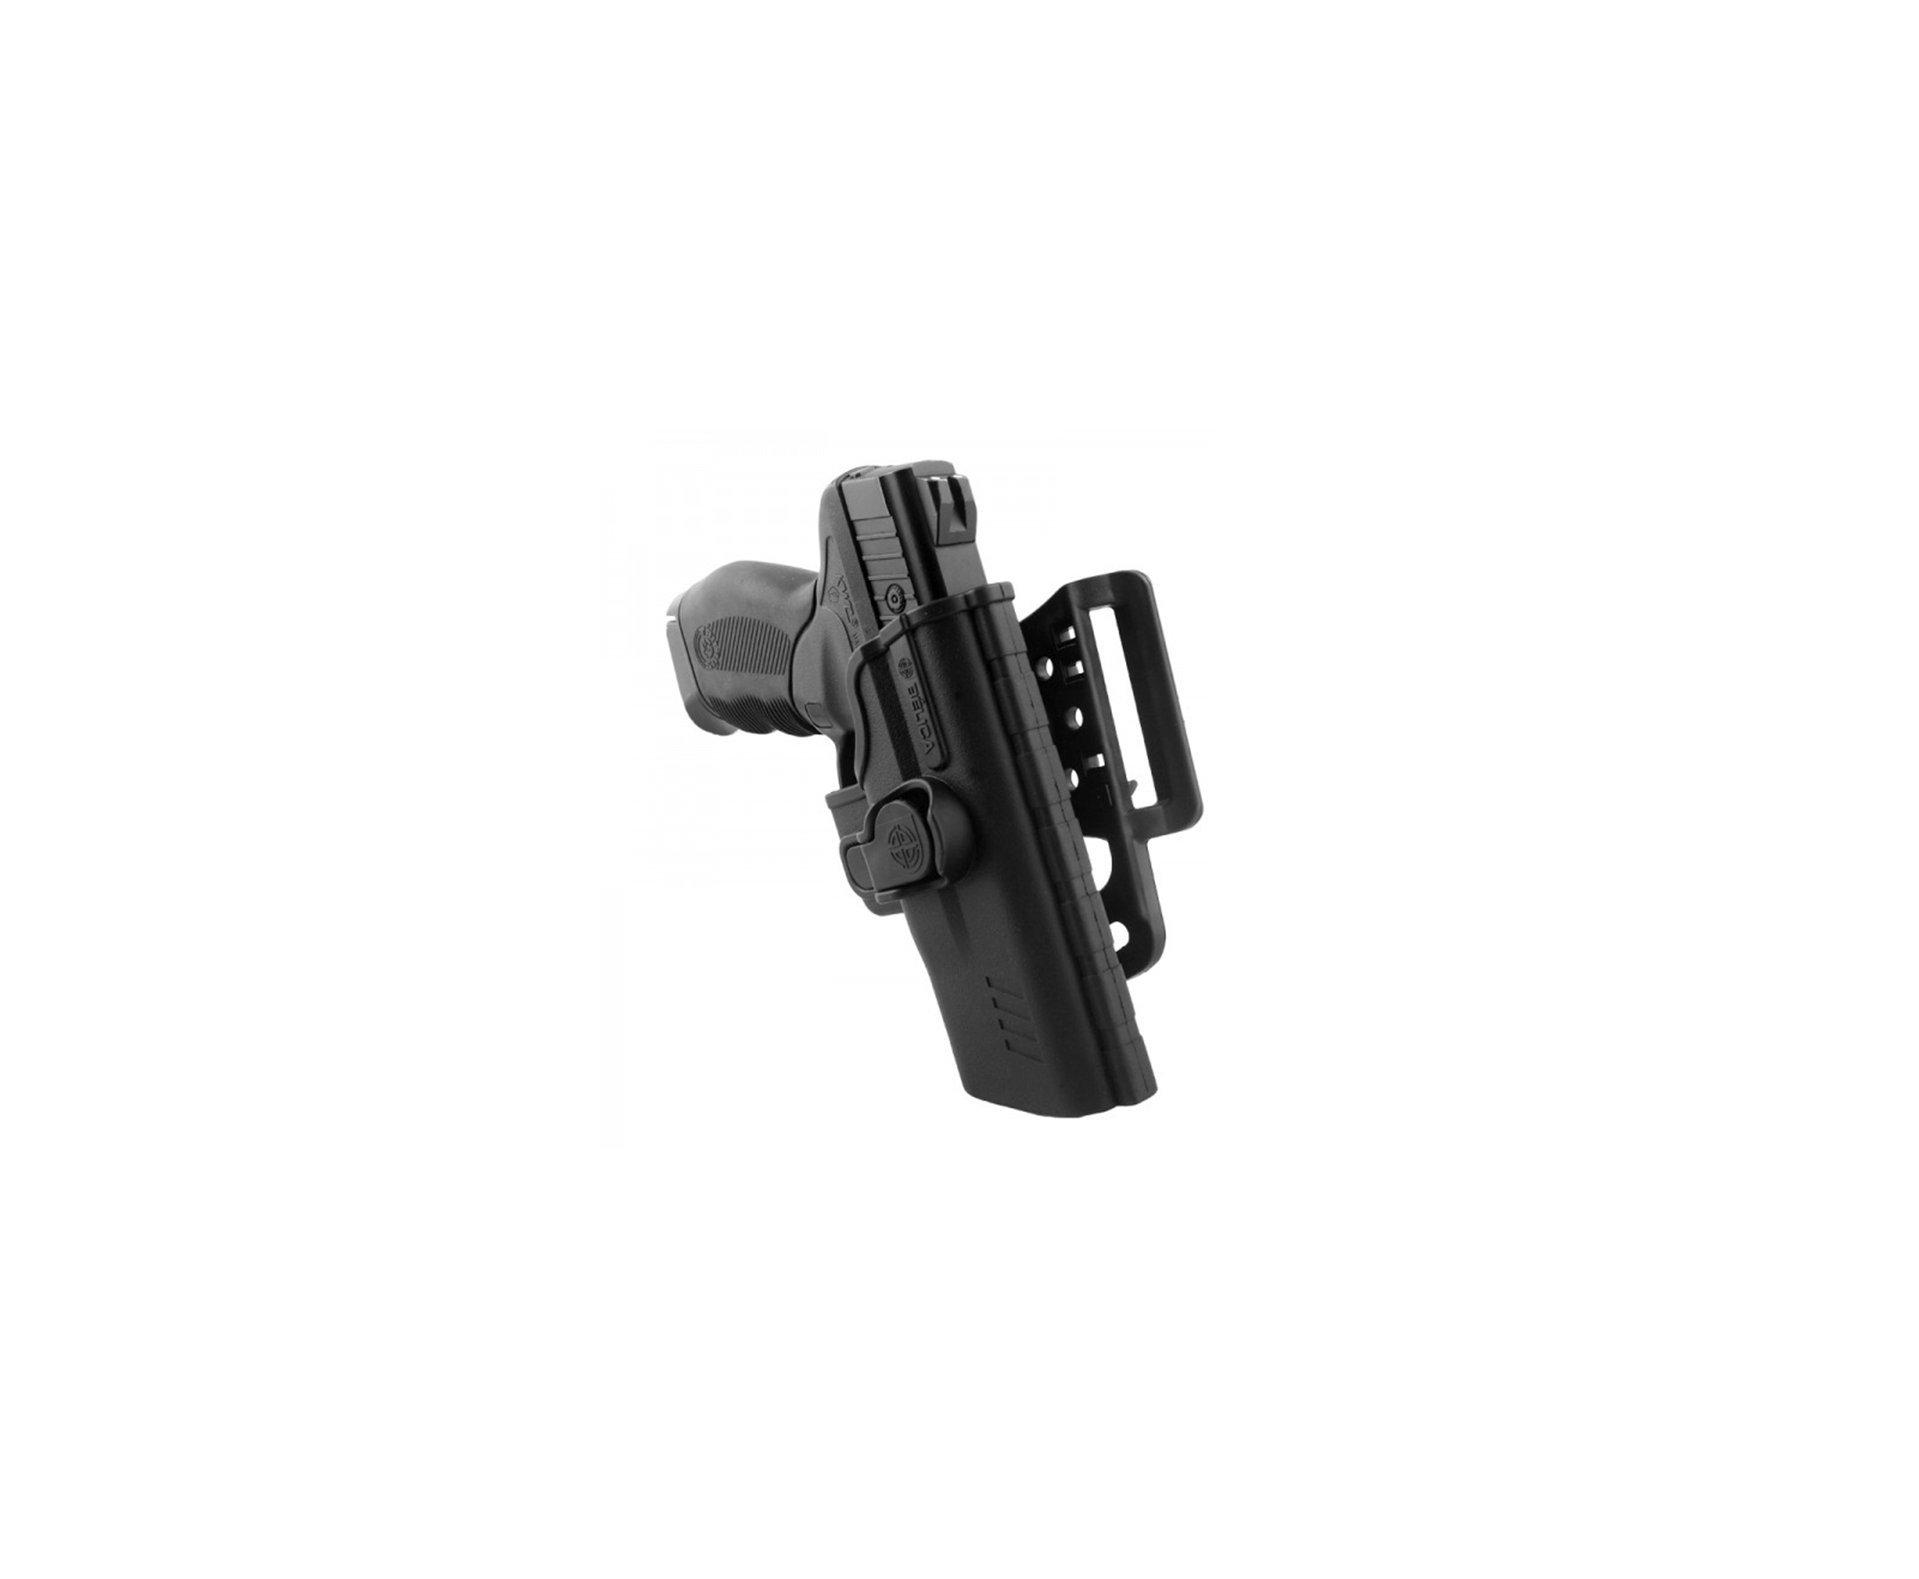 Coldre Pro Sr1 Pistola 24/7, Cz, Imbel, Taurus Destro - Belica